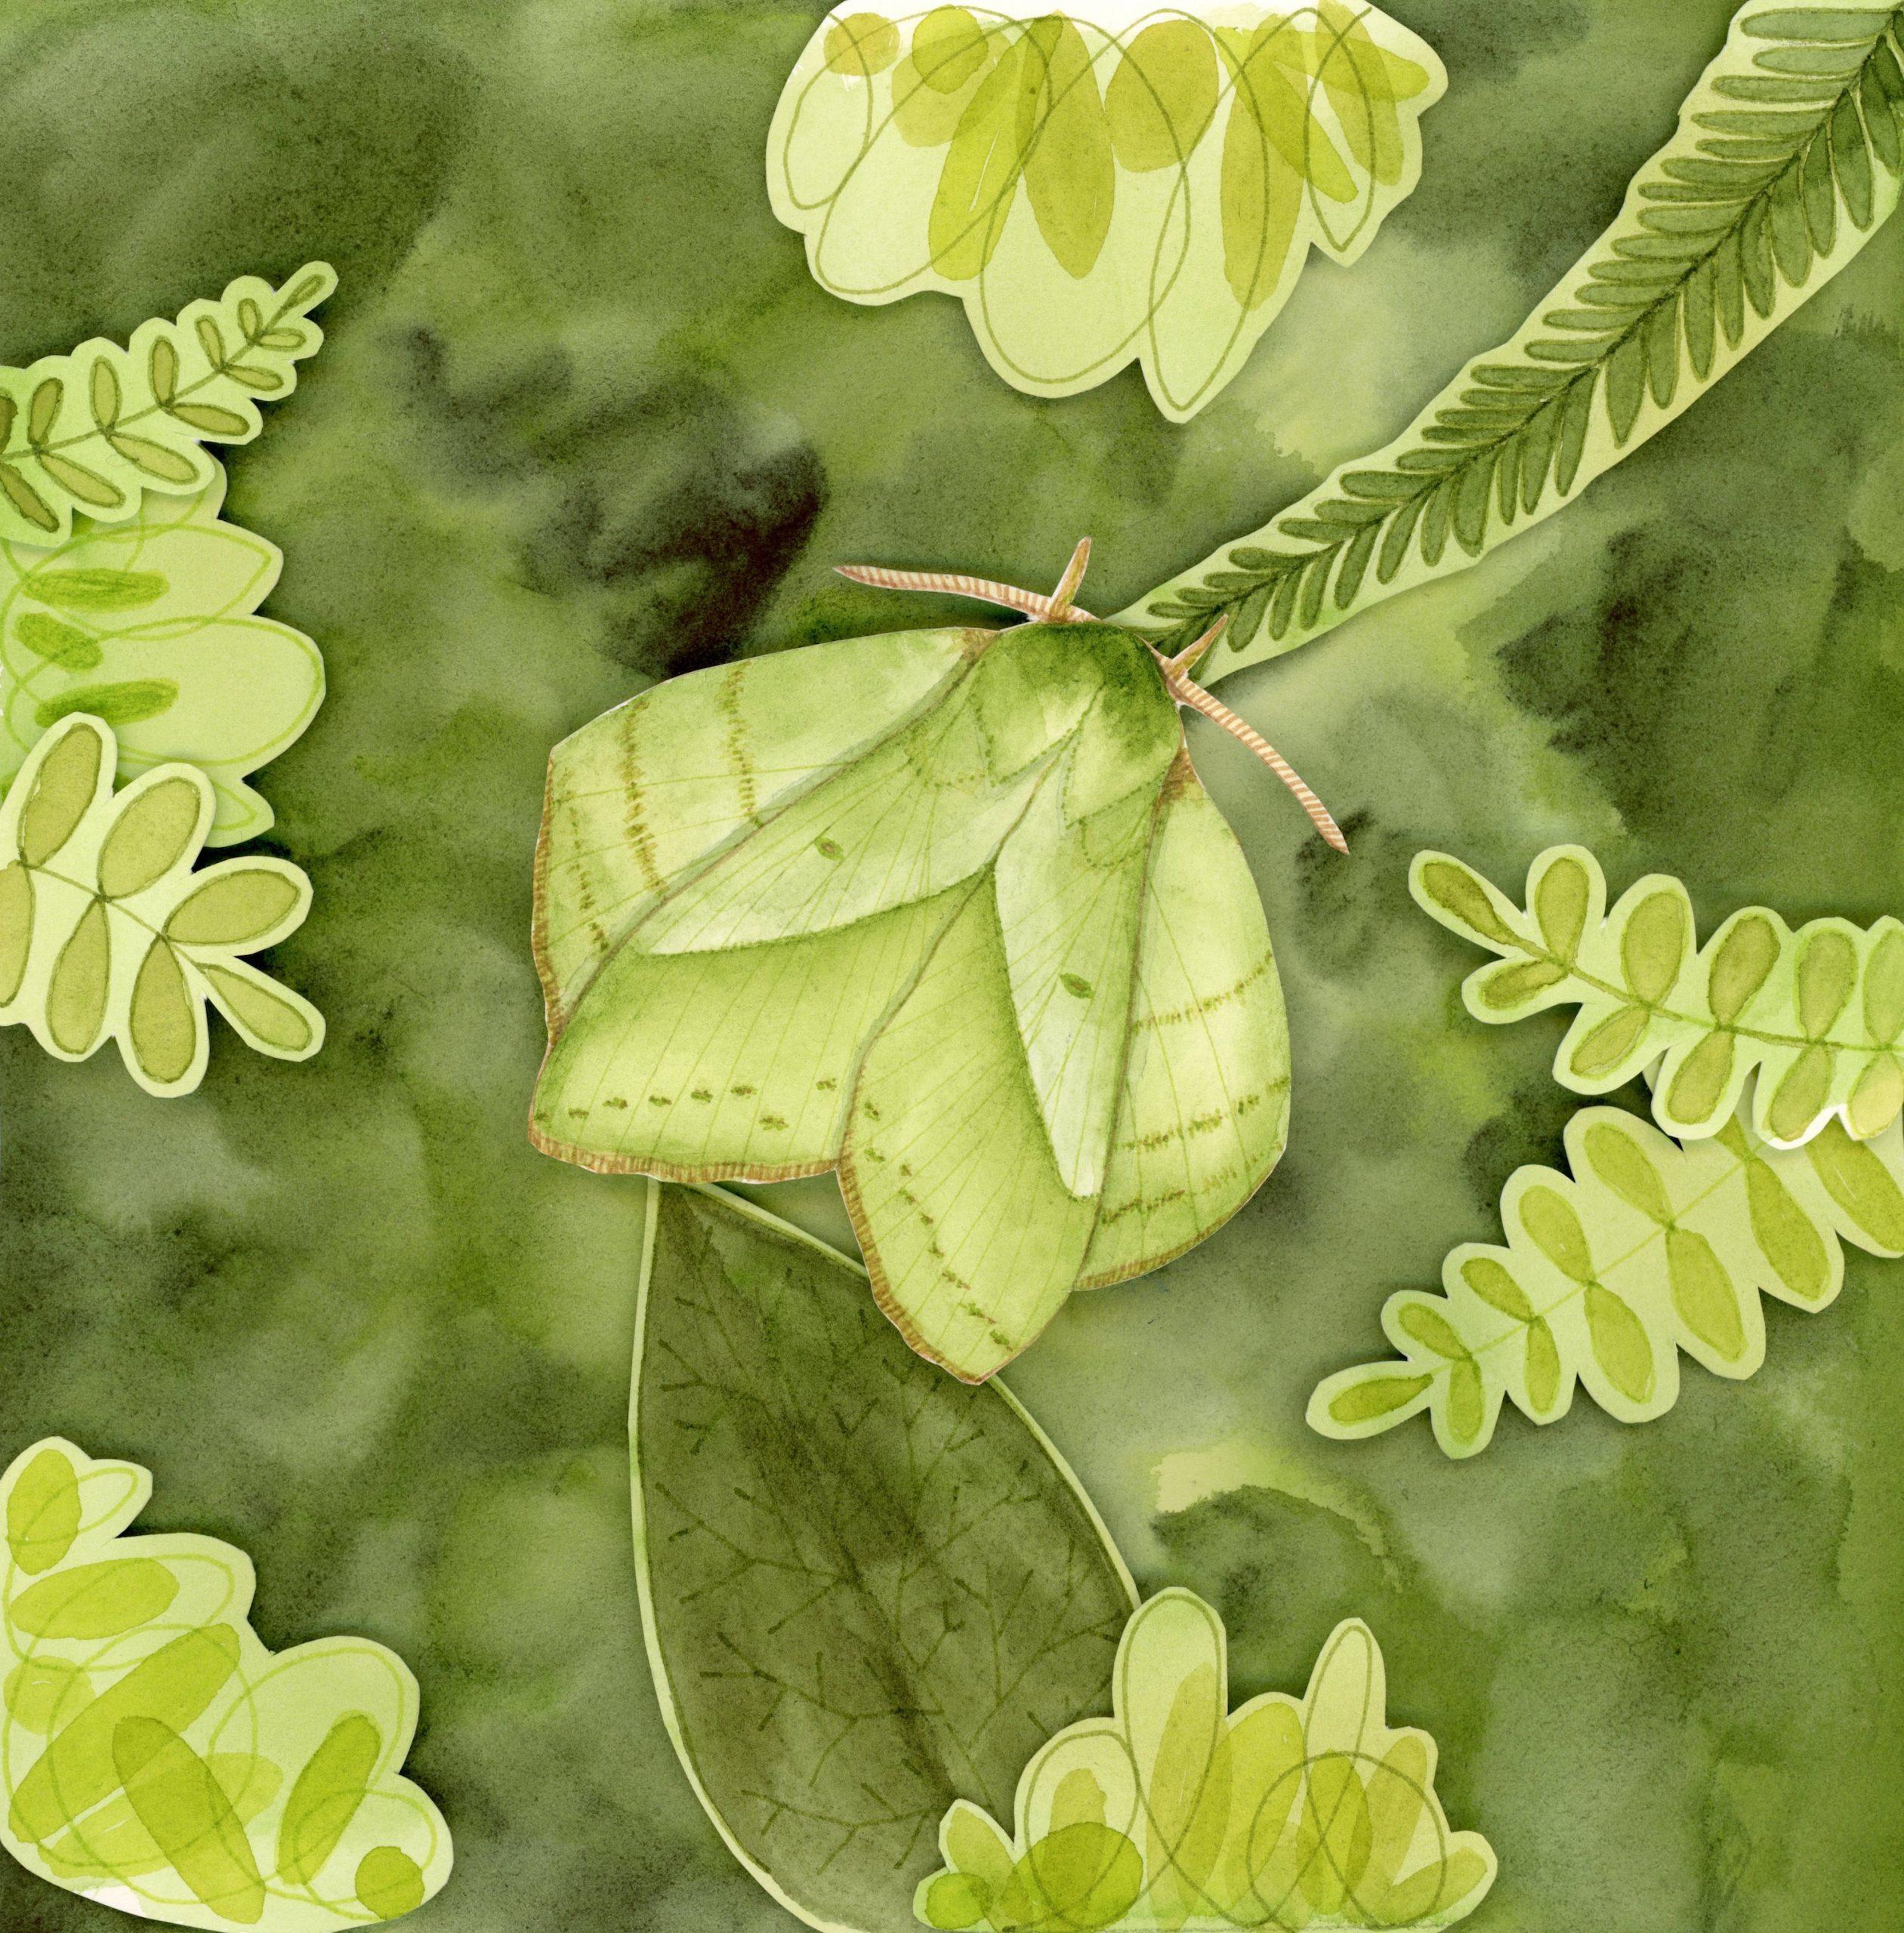 Lappet moth shadowbox 3D watercolor